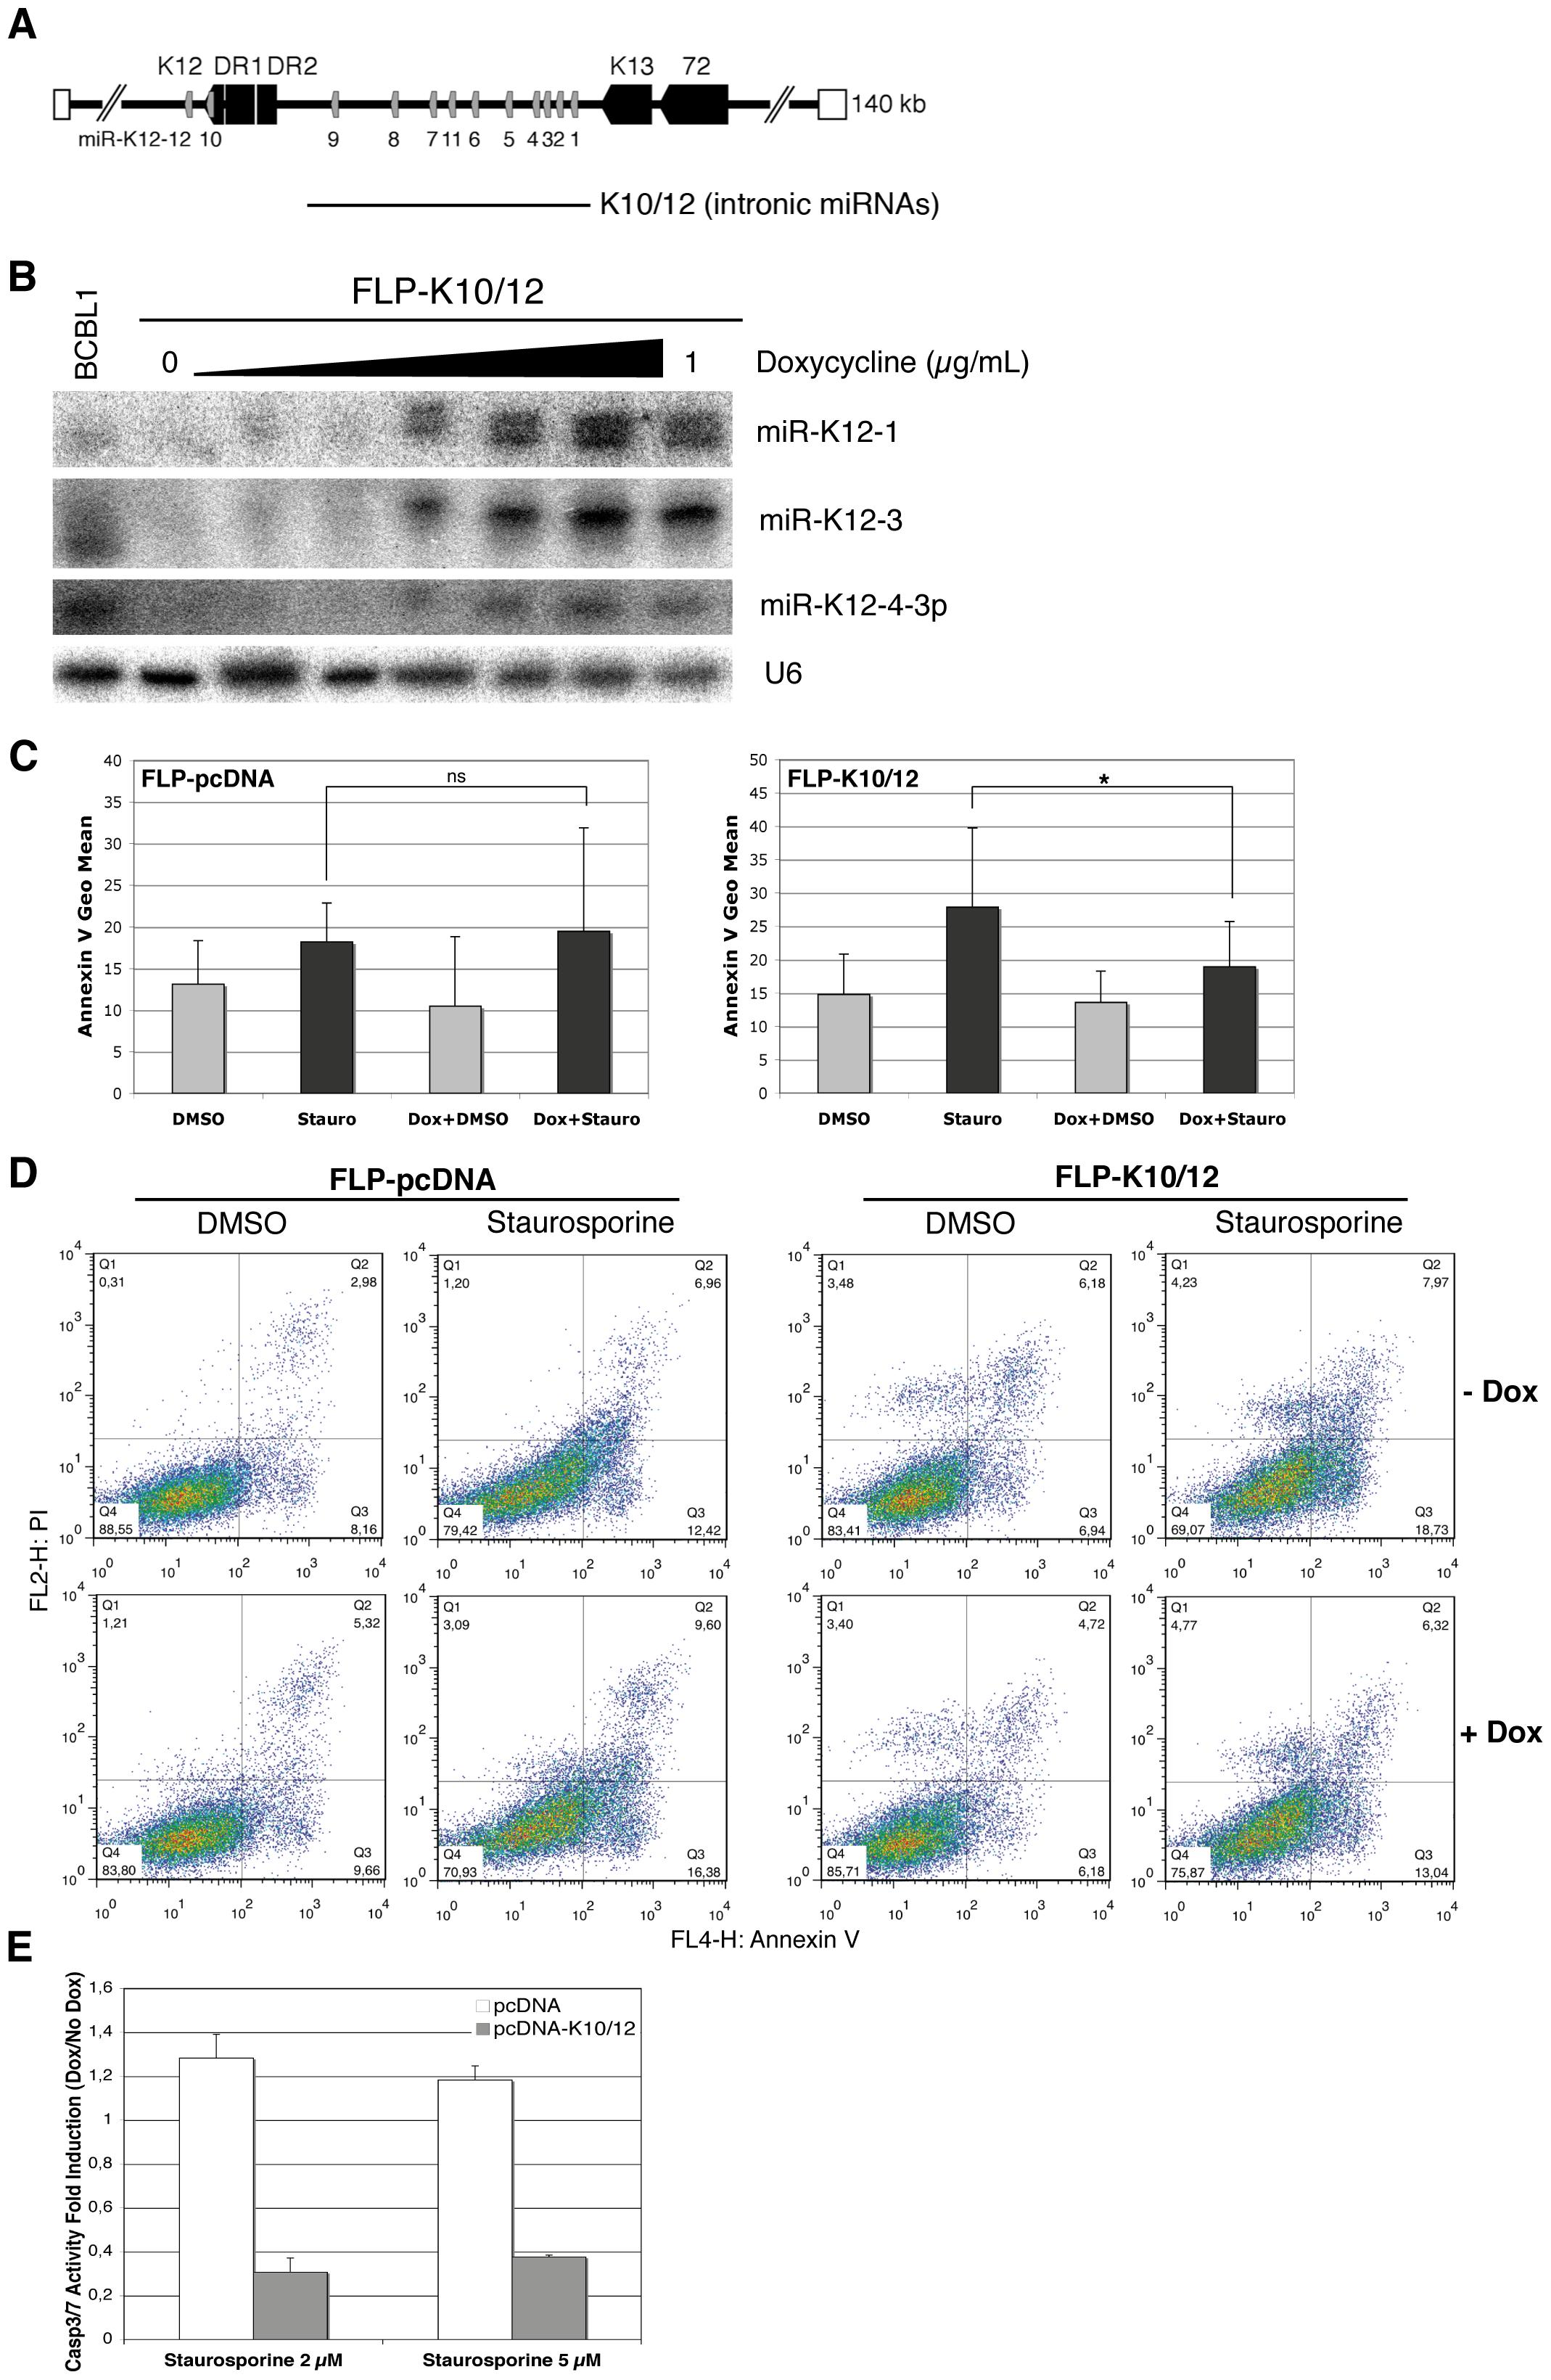 HEK293 cells expressing KSHV miRNAs are less sensitive to apoptosis.